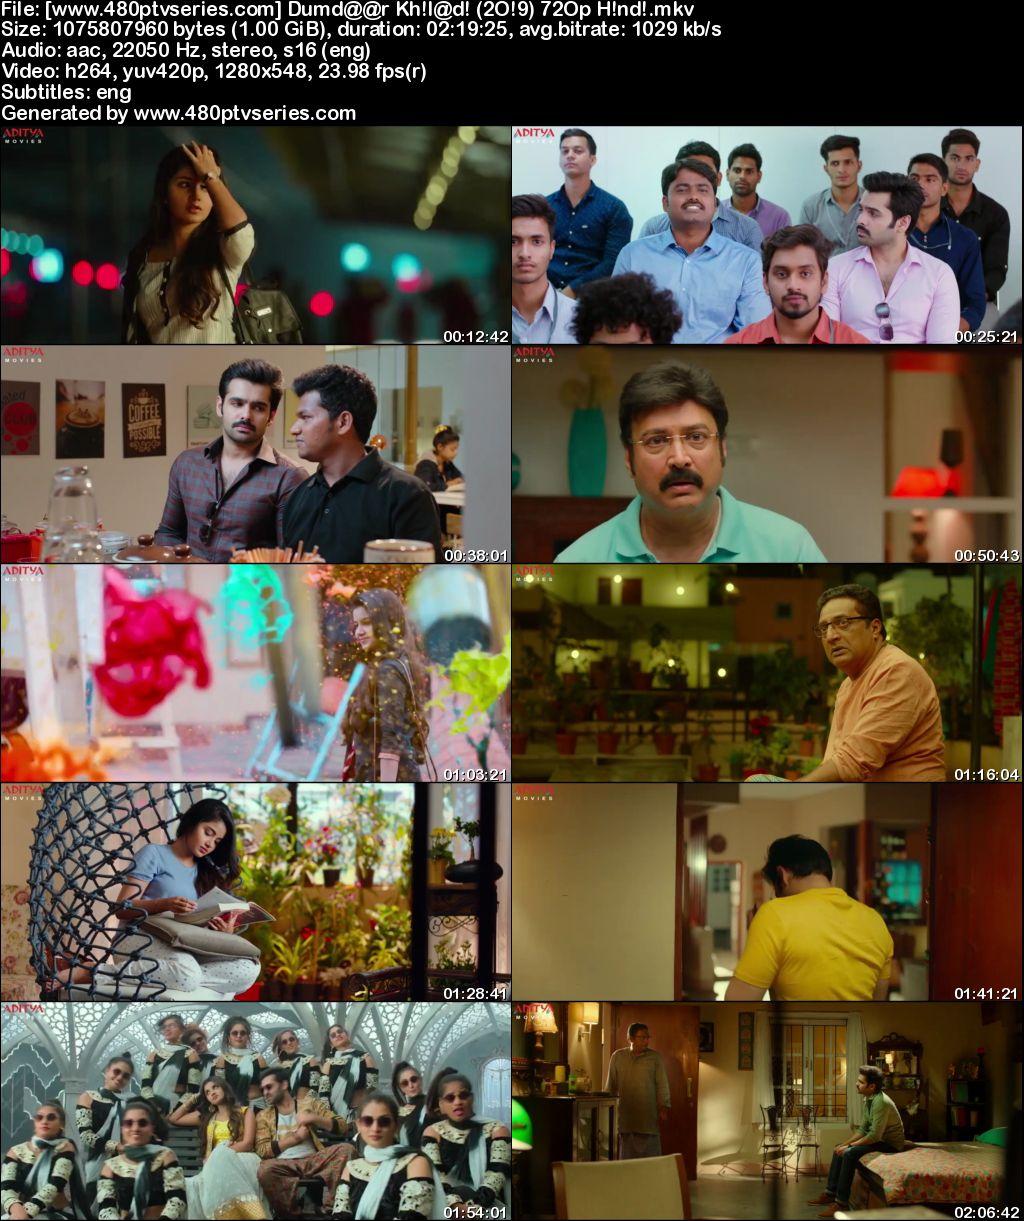 Watch Online Free Dumdaar Khiladi (2019) Full Hindi Dubbed Movie Download 480p 720p HDRip